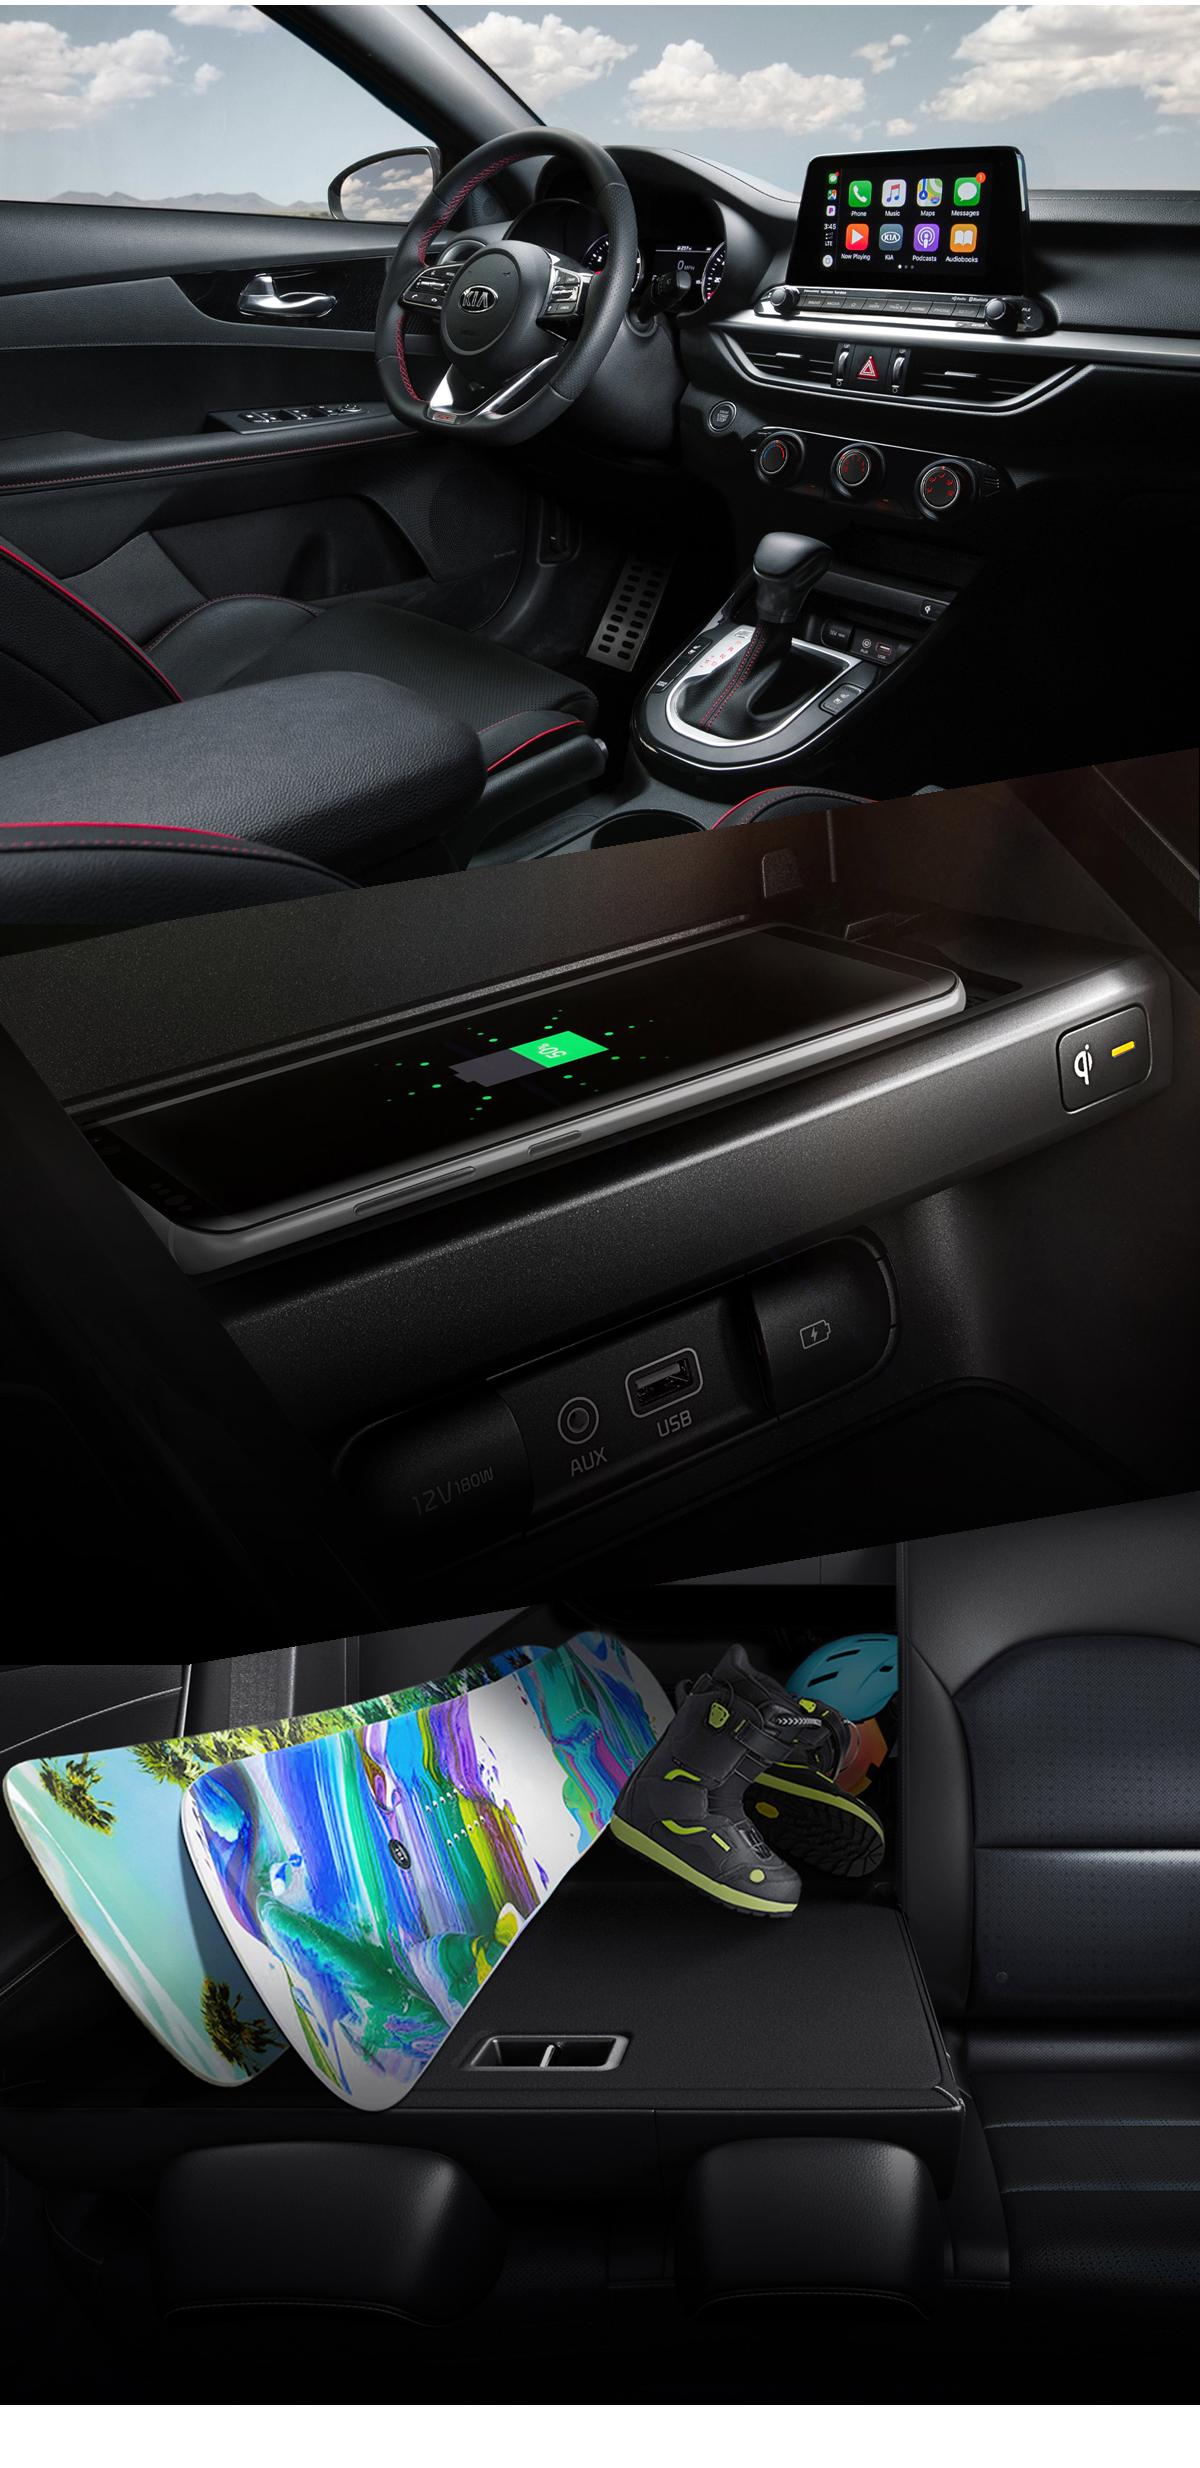 2021 Kia Forte Interior Images